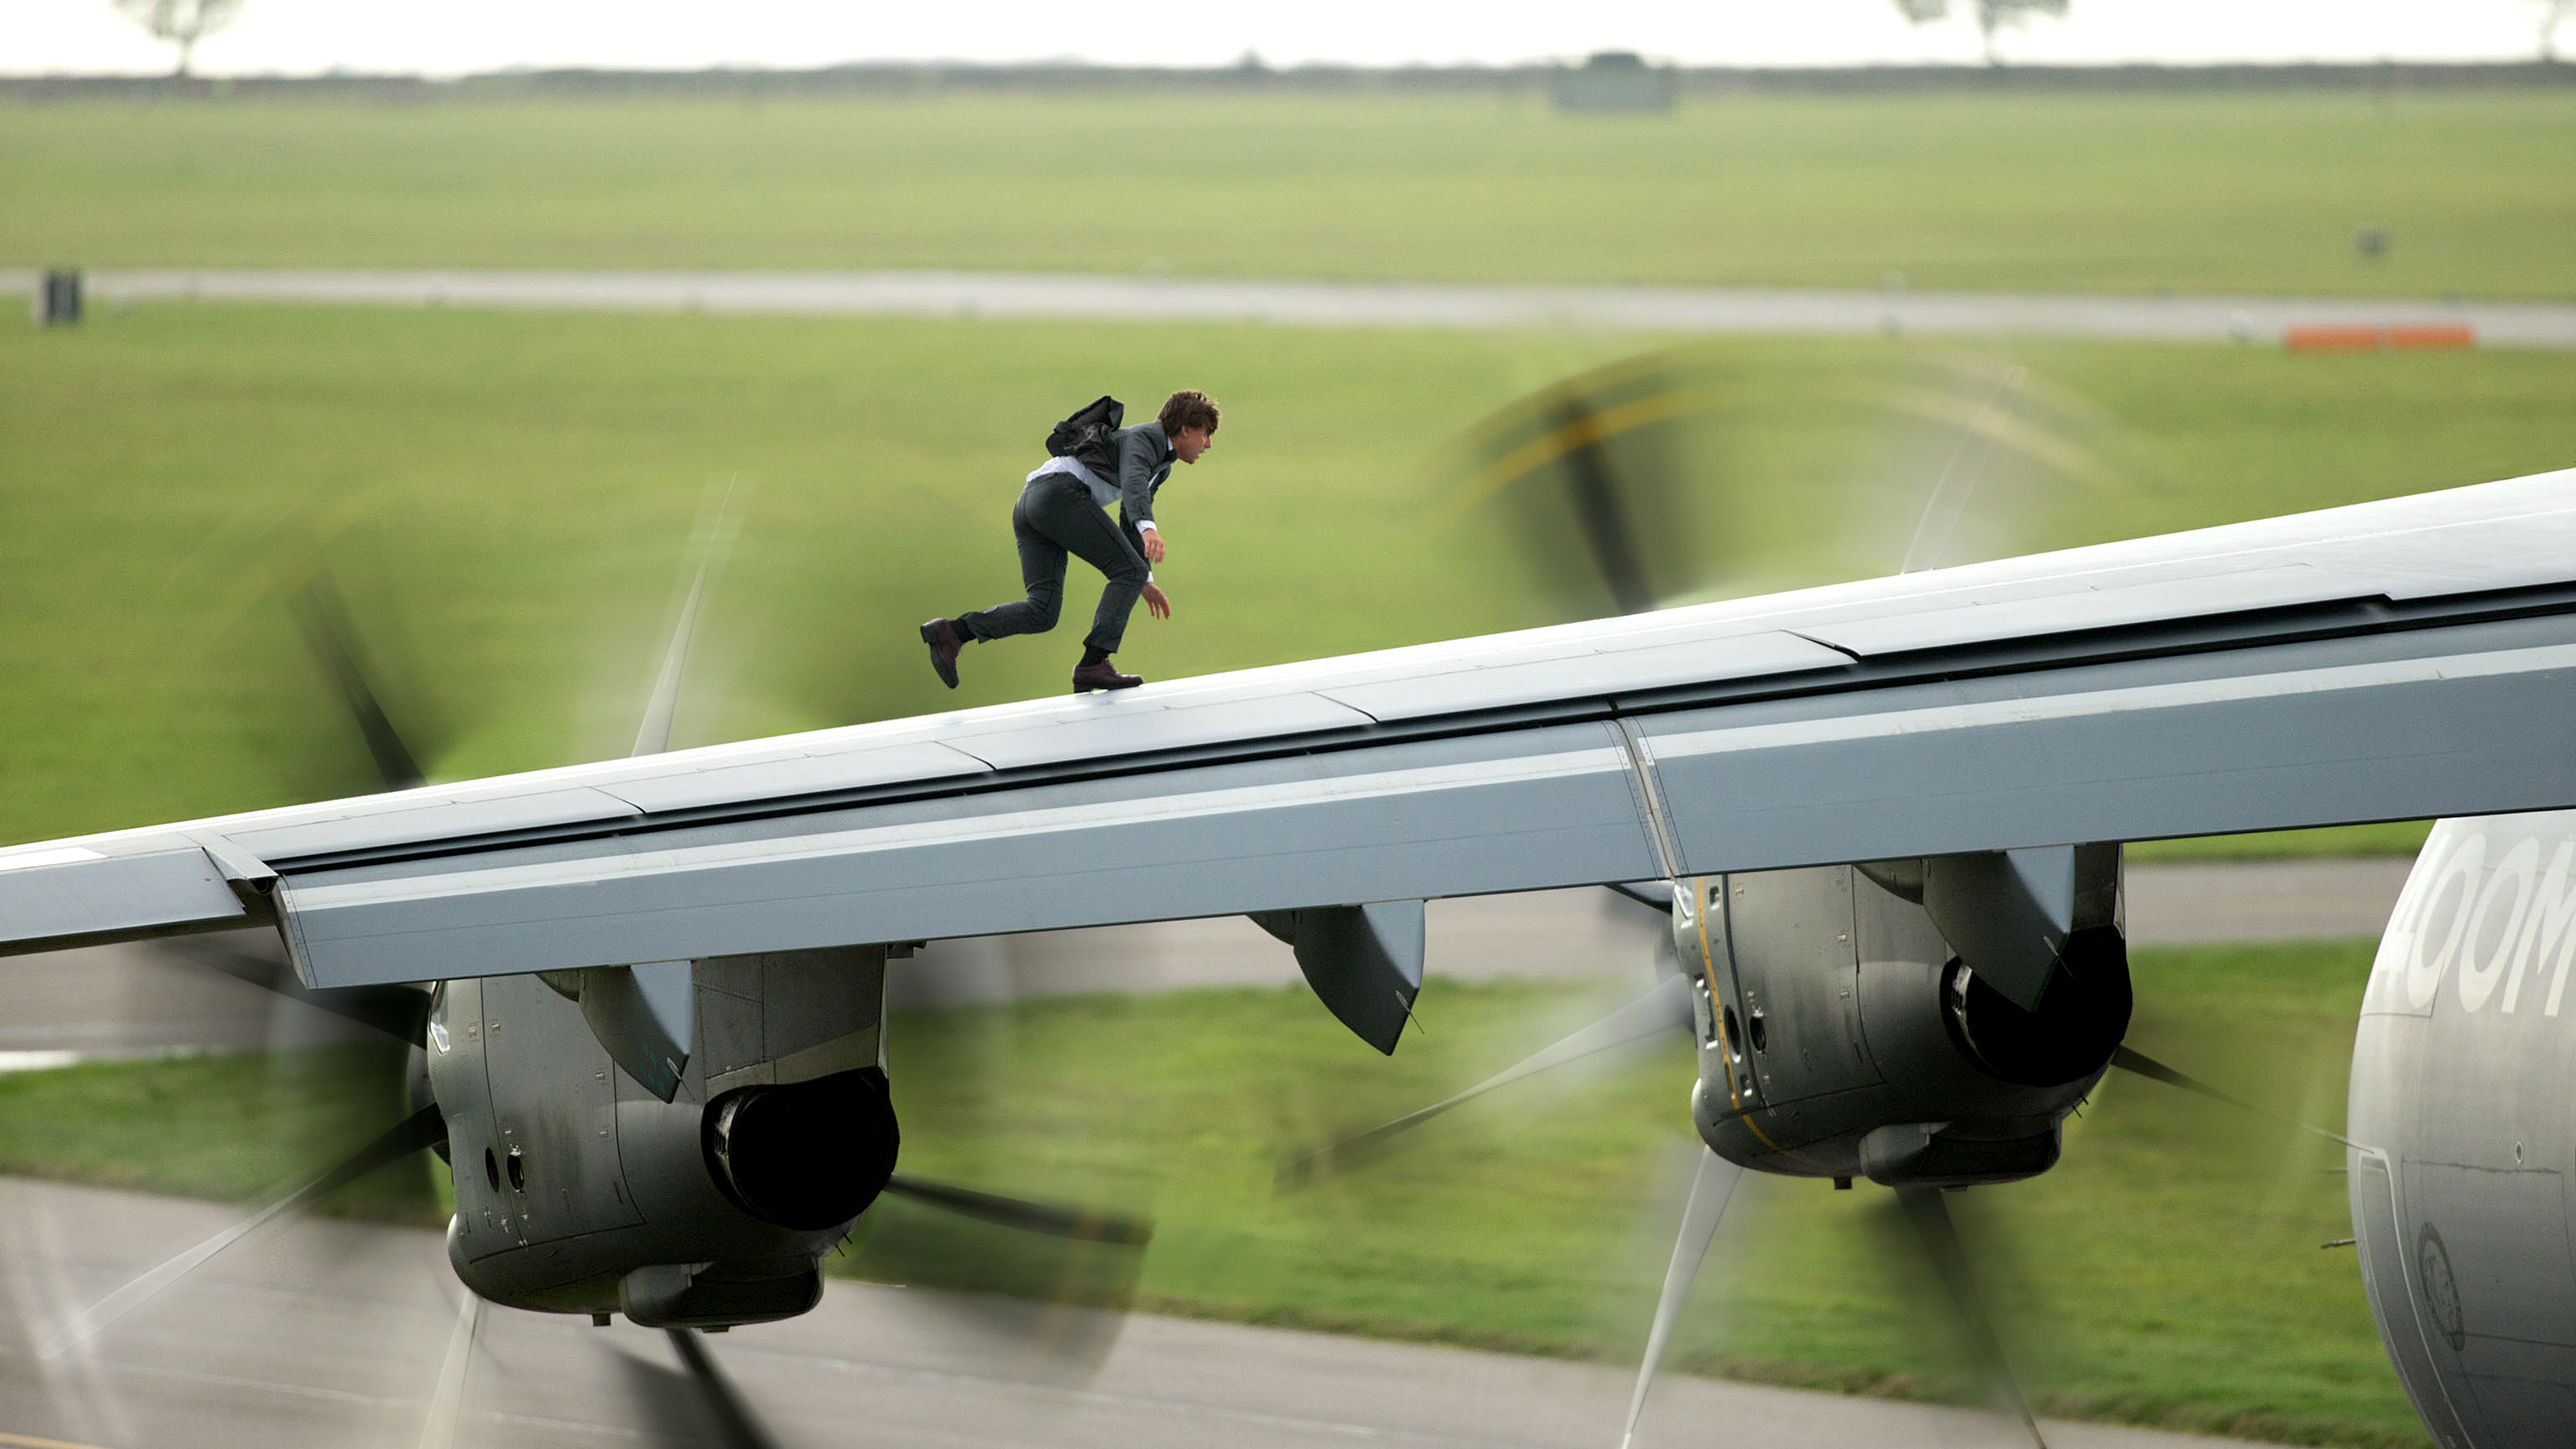 avion tom cruise mision imposible nacion secreta